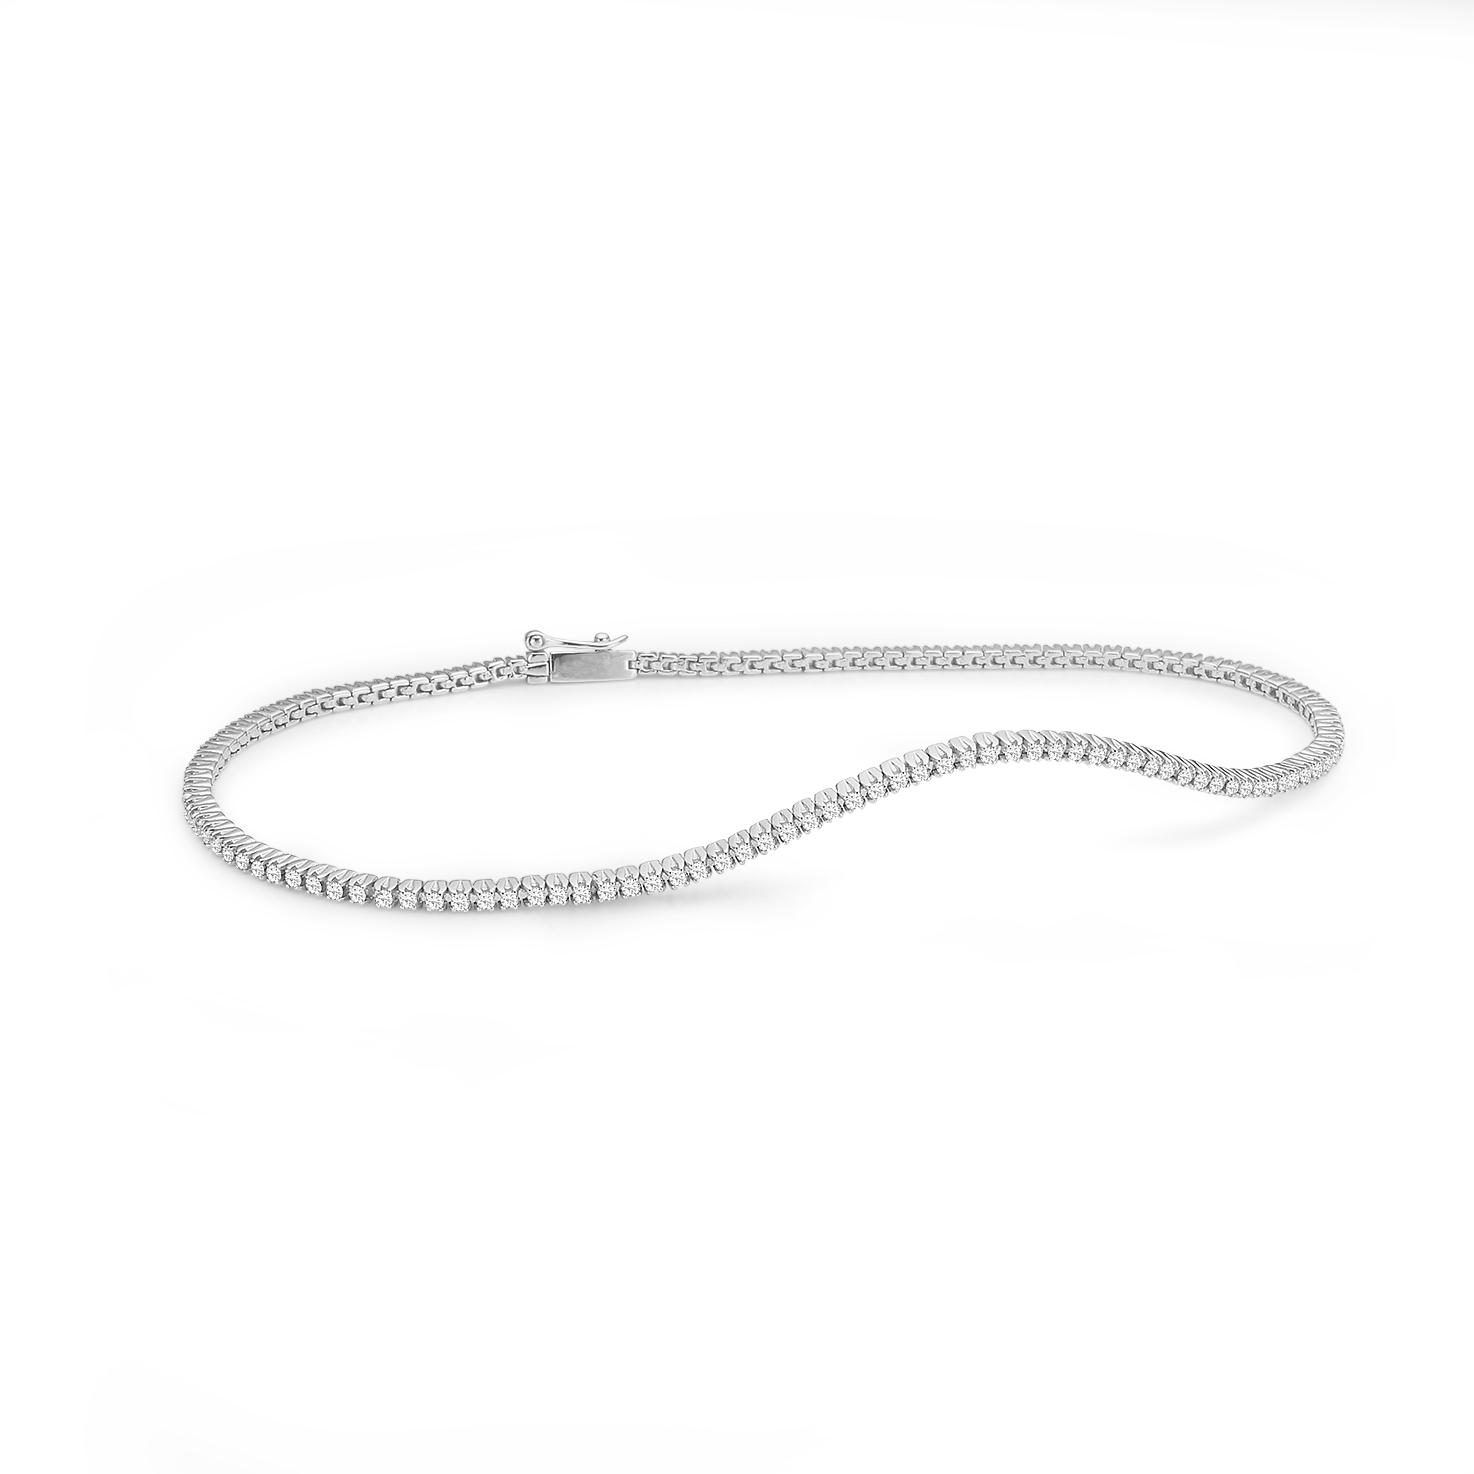 aagaard Aagaard 14 kt hvidguld armbånd med diamanter - 44101797-18 18 centimeter fra brodersen + kobborg